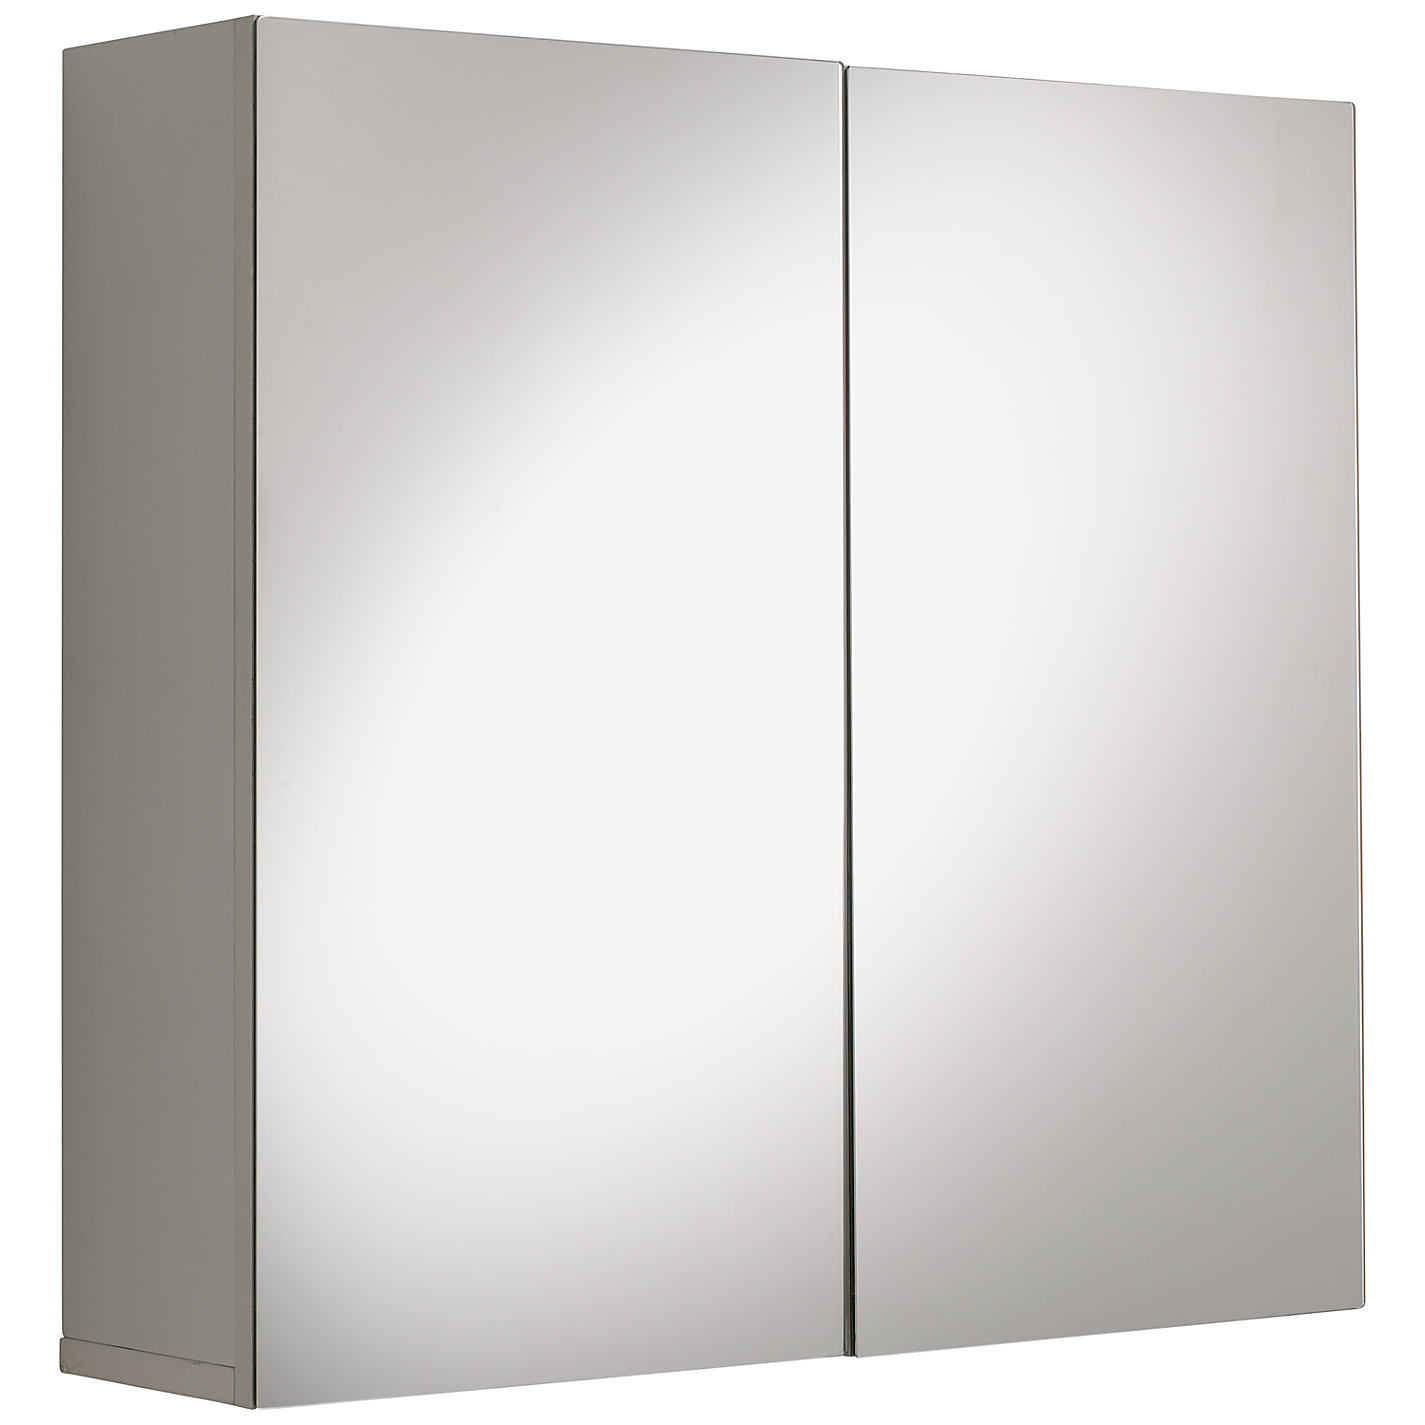 Double Mirrored Bathroom Cabinet Mirrored Cabinet Bathroom Bathroom Design Ideas